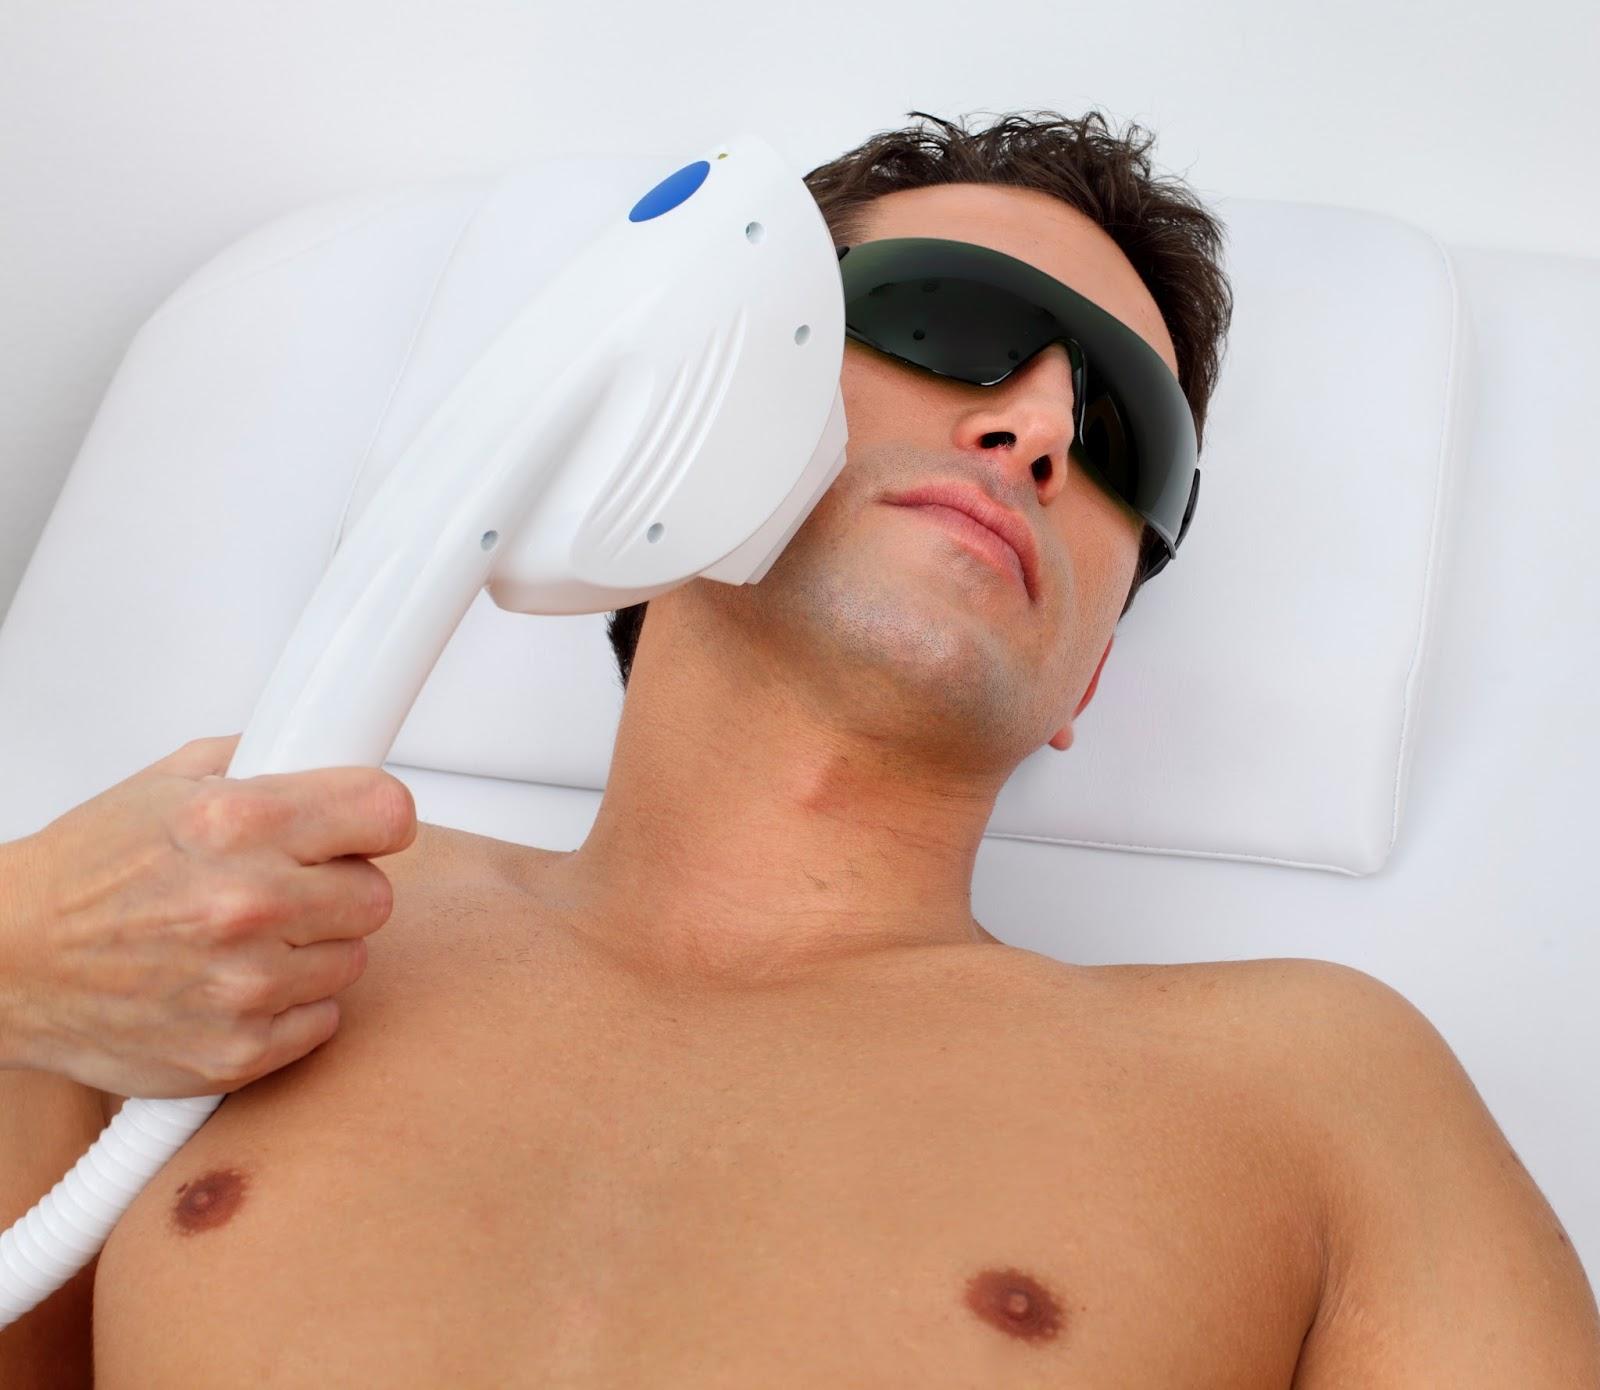 halifax ns photofacial medispa spa treatment